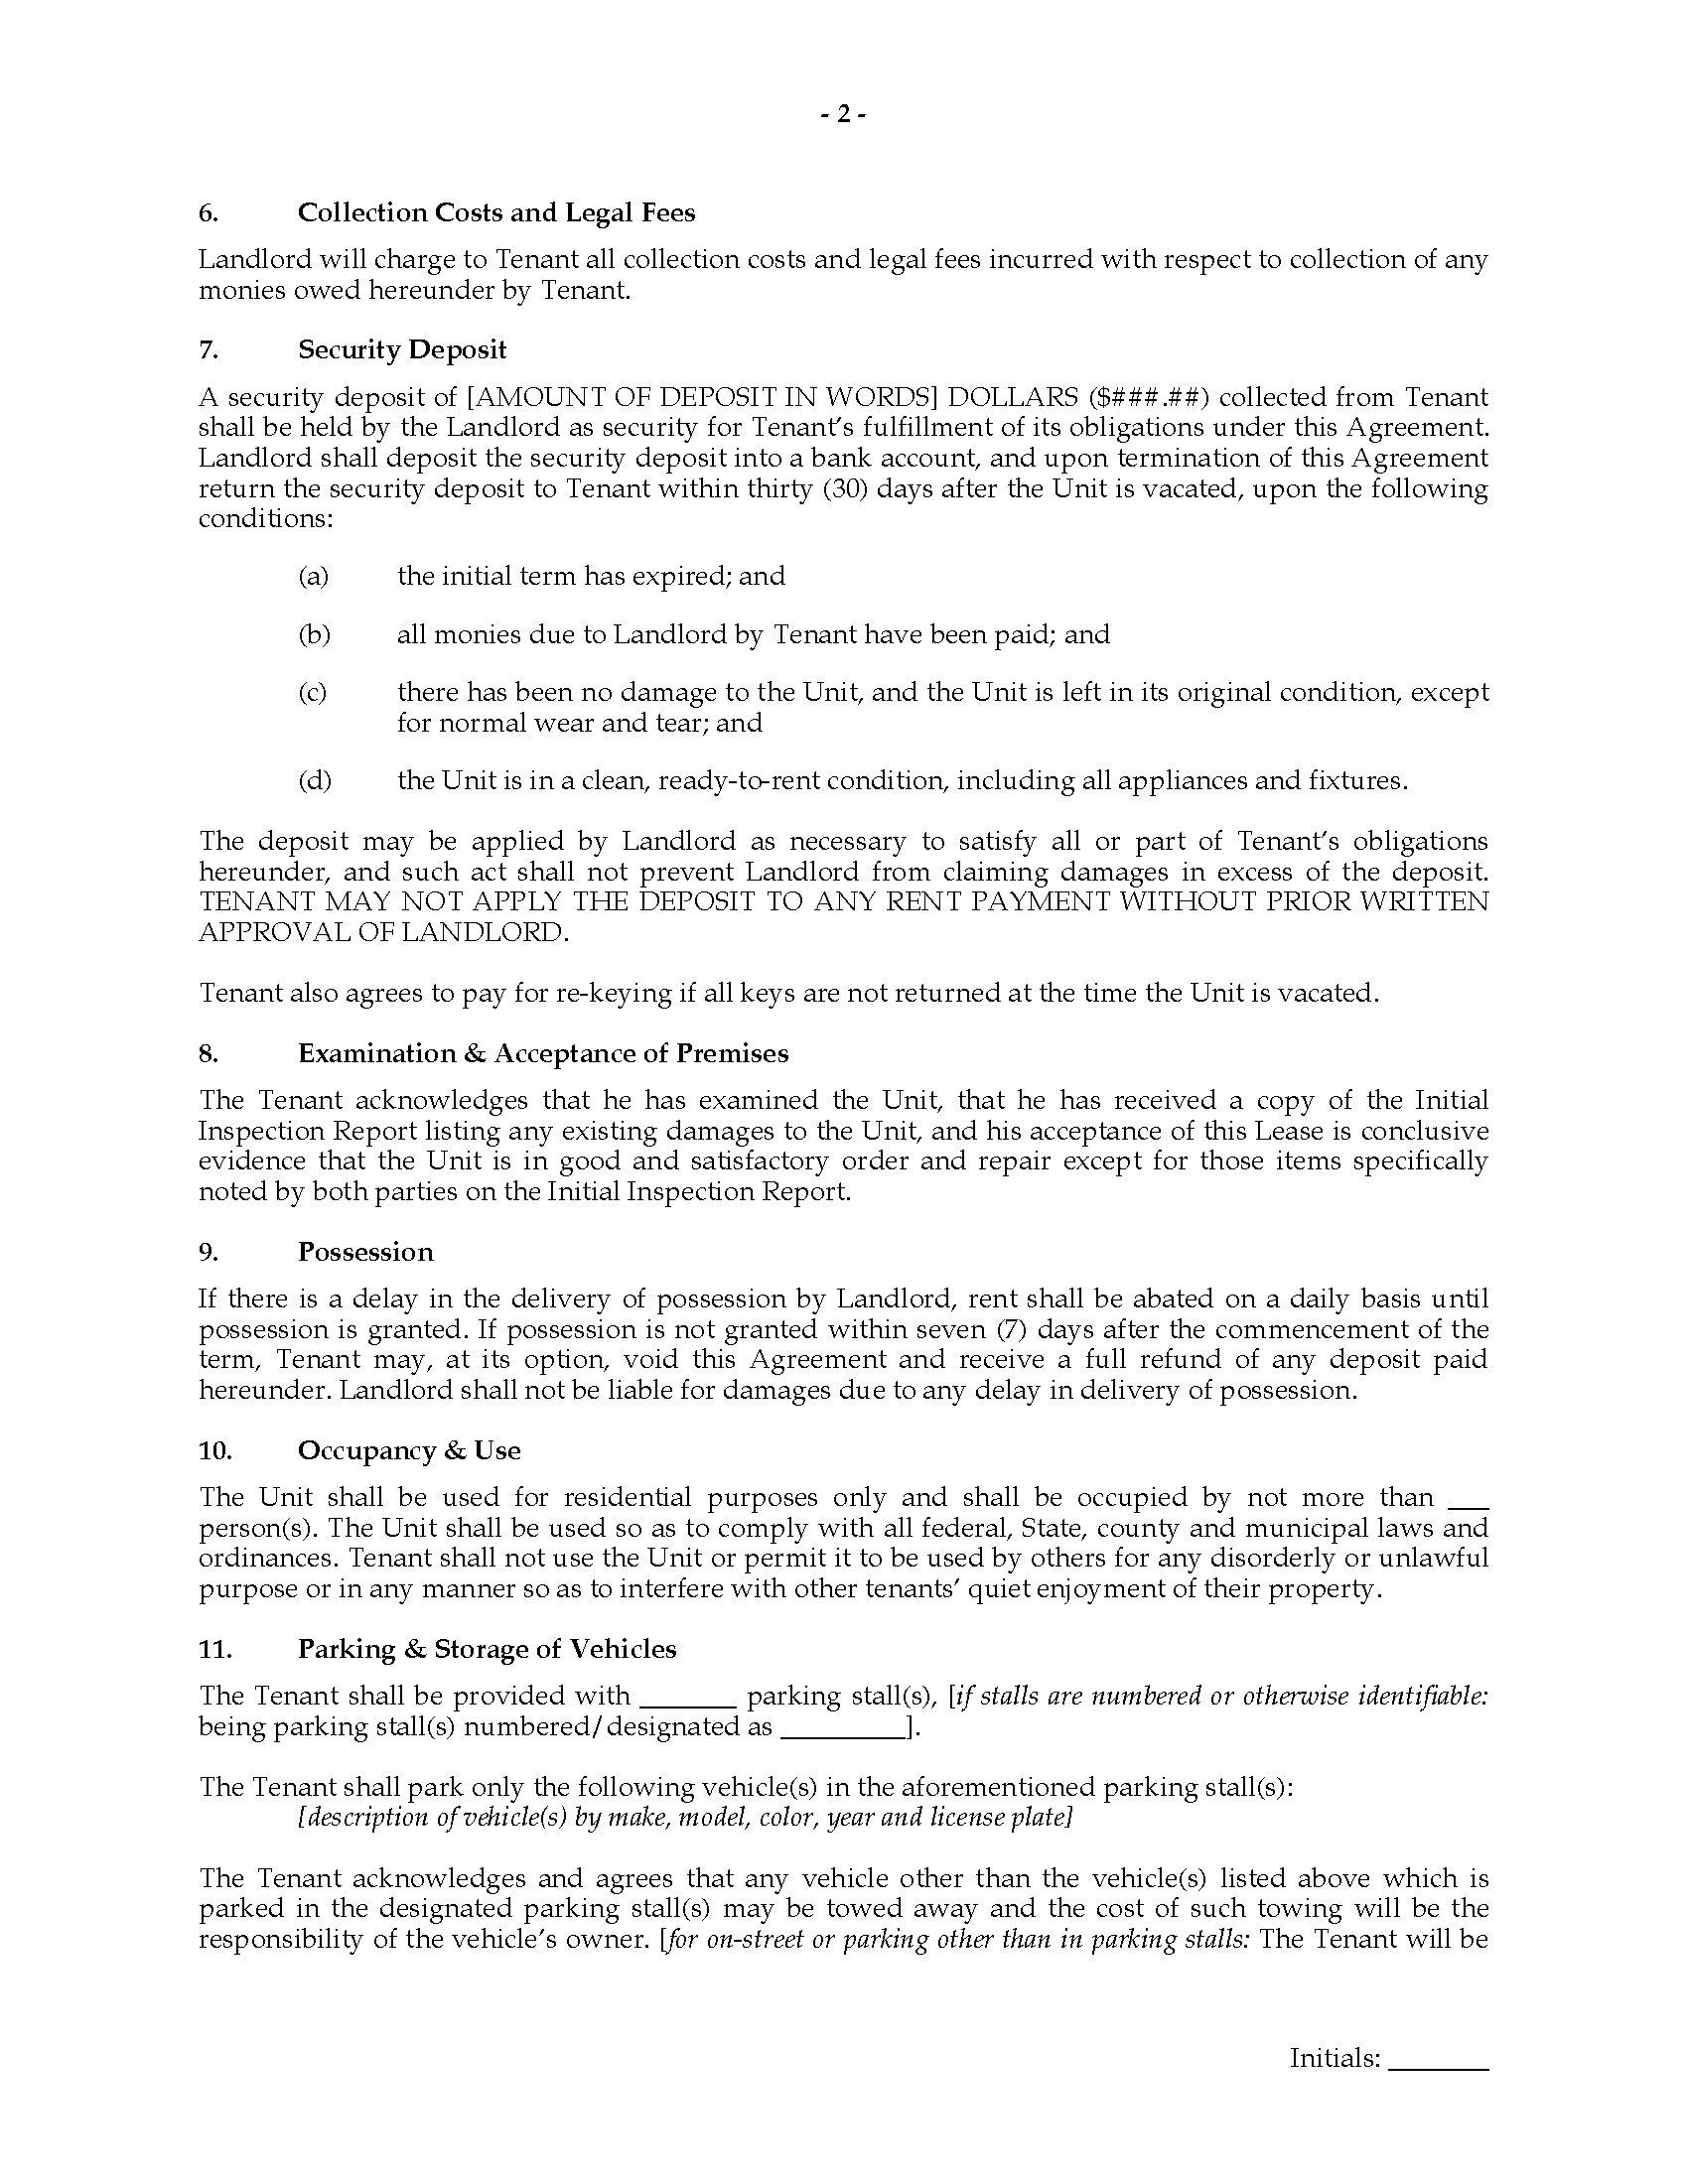 mortgage subordination agreement template .